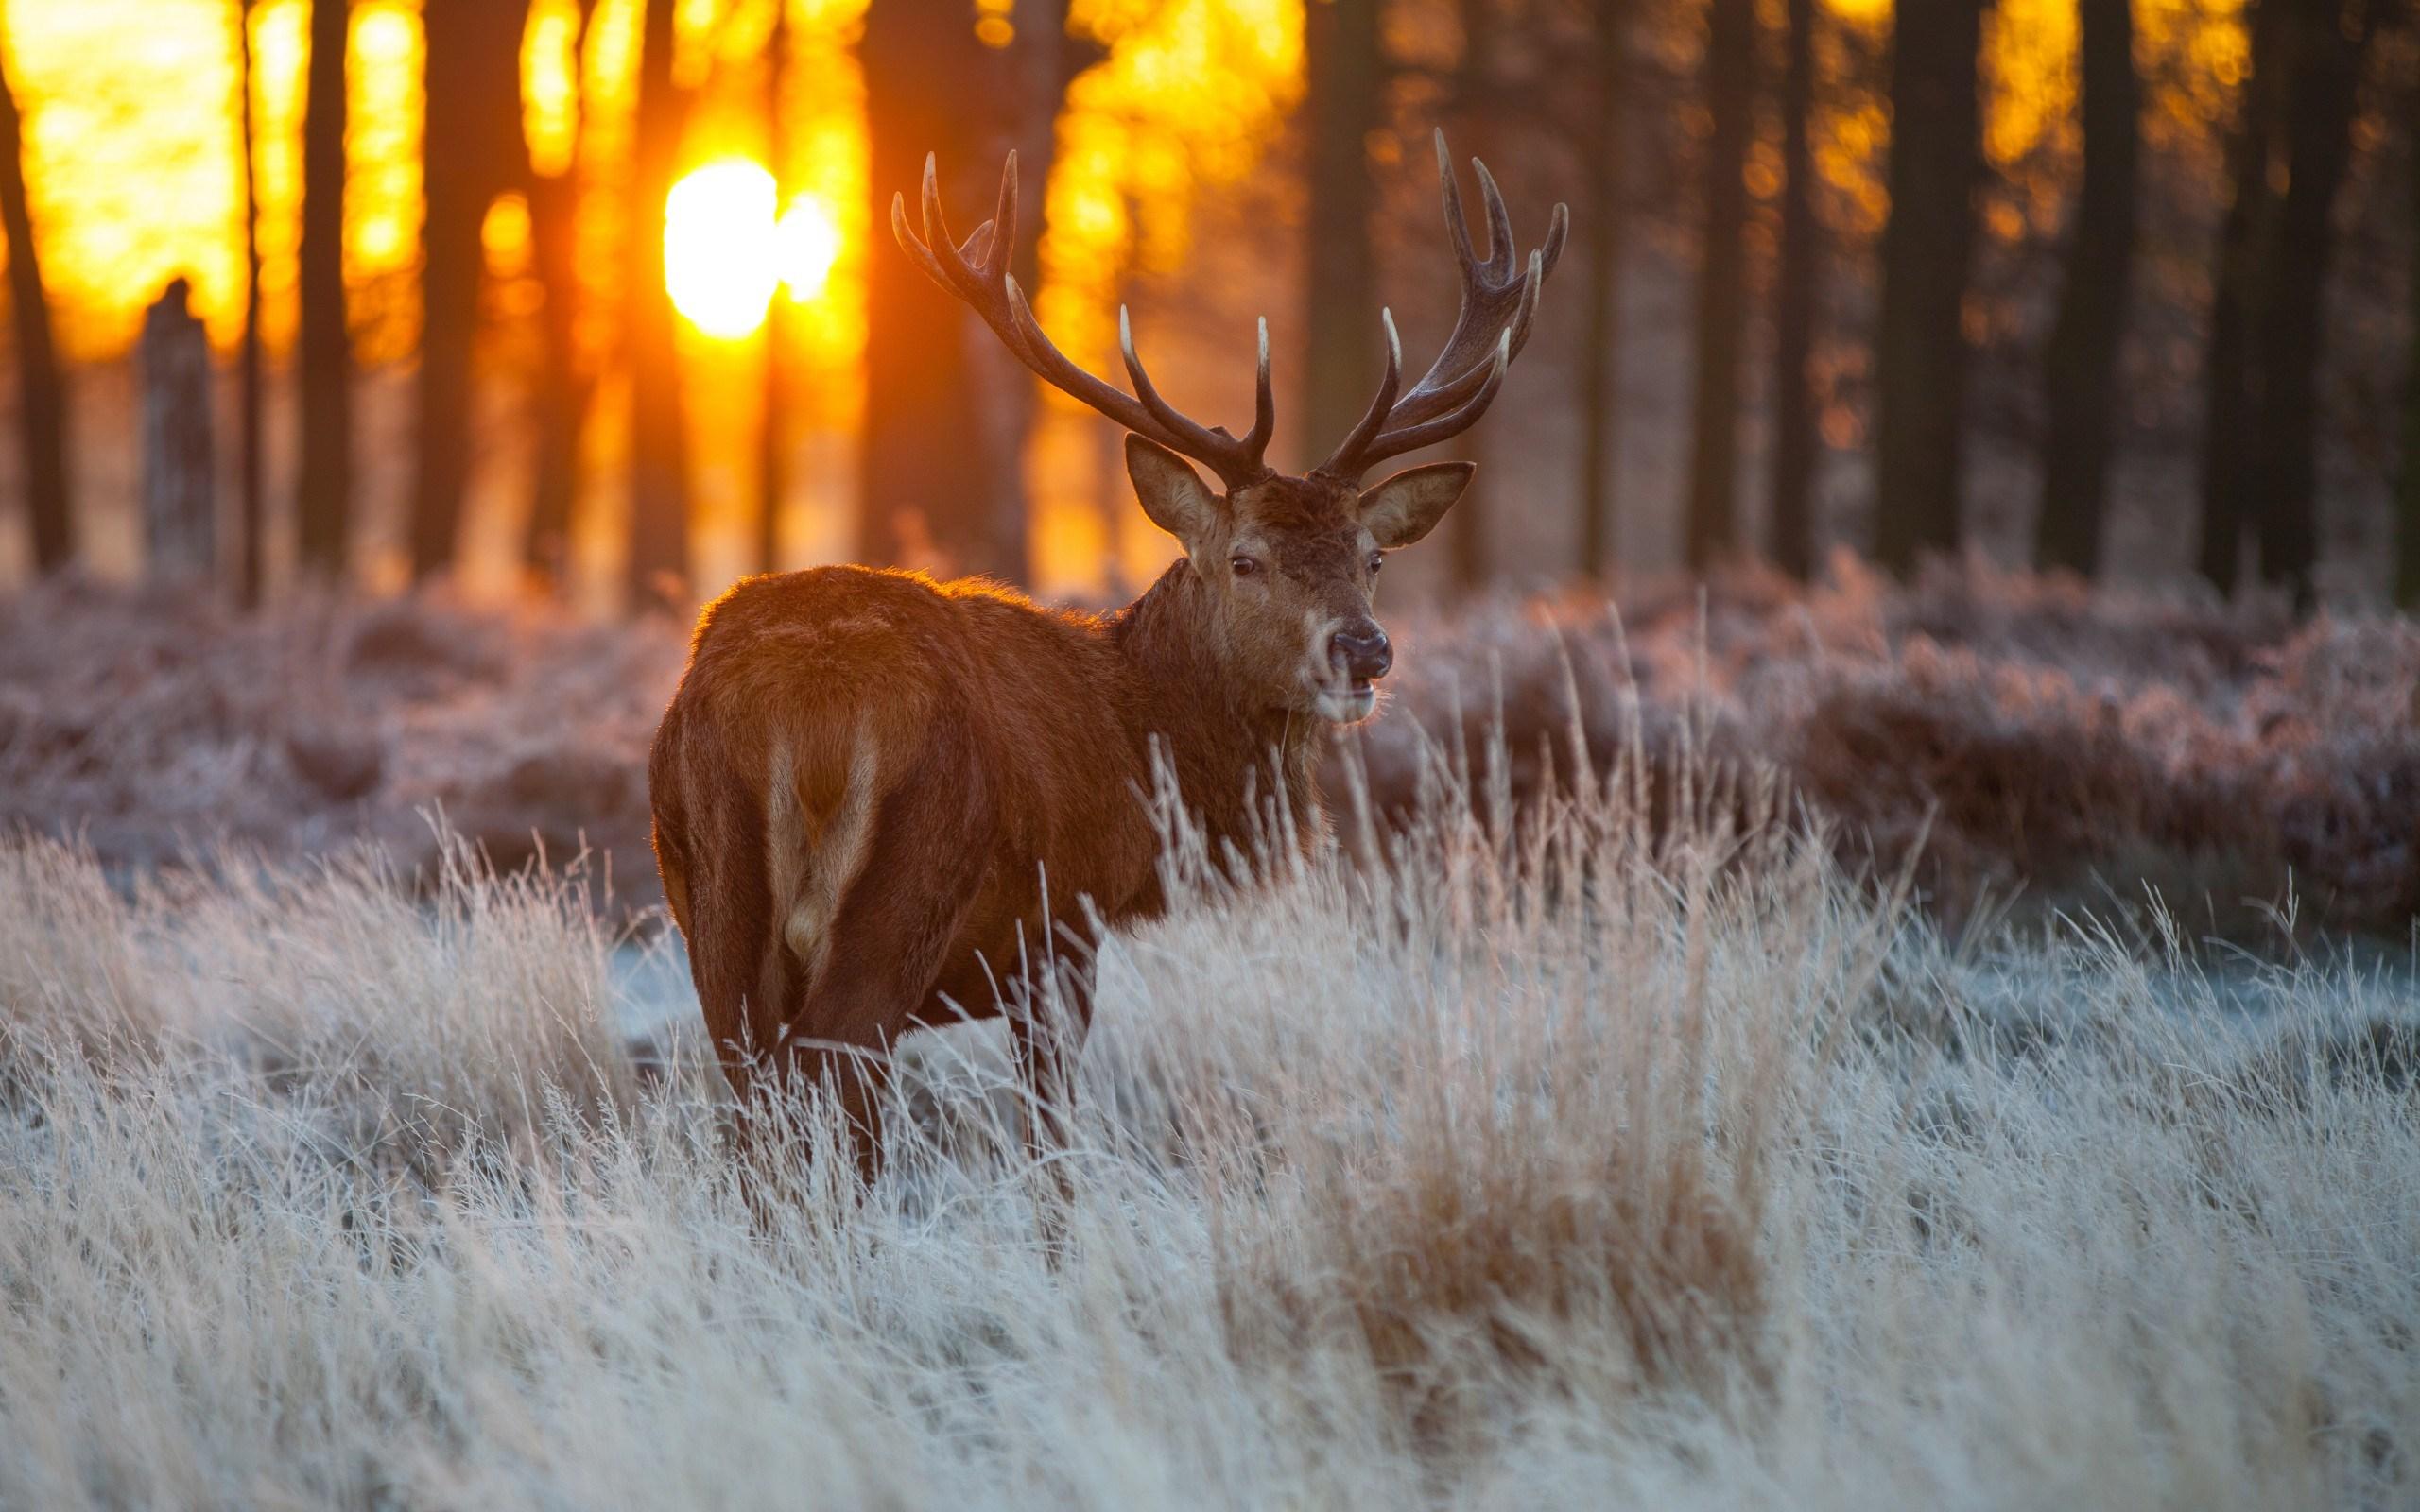 Trees Deer Look The Sun Nature